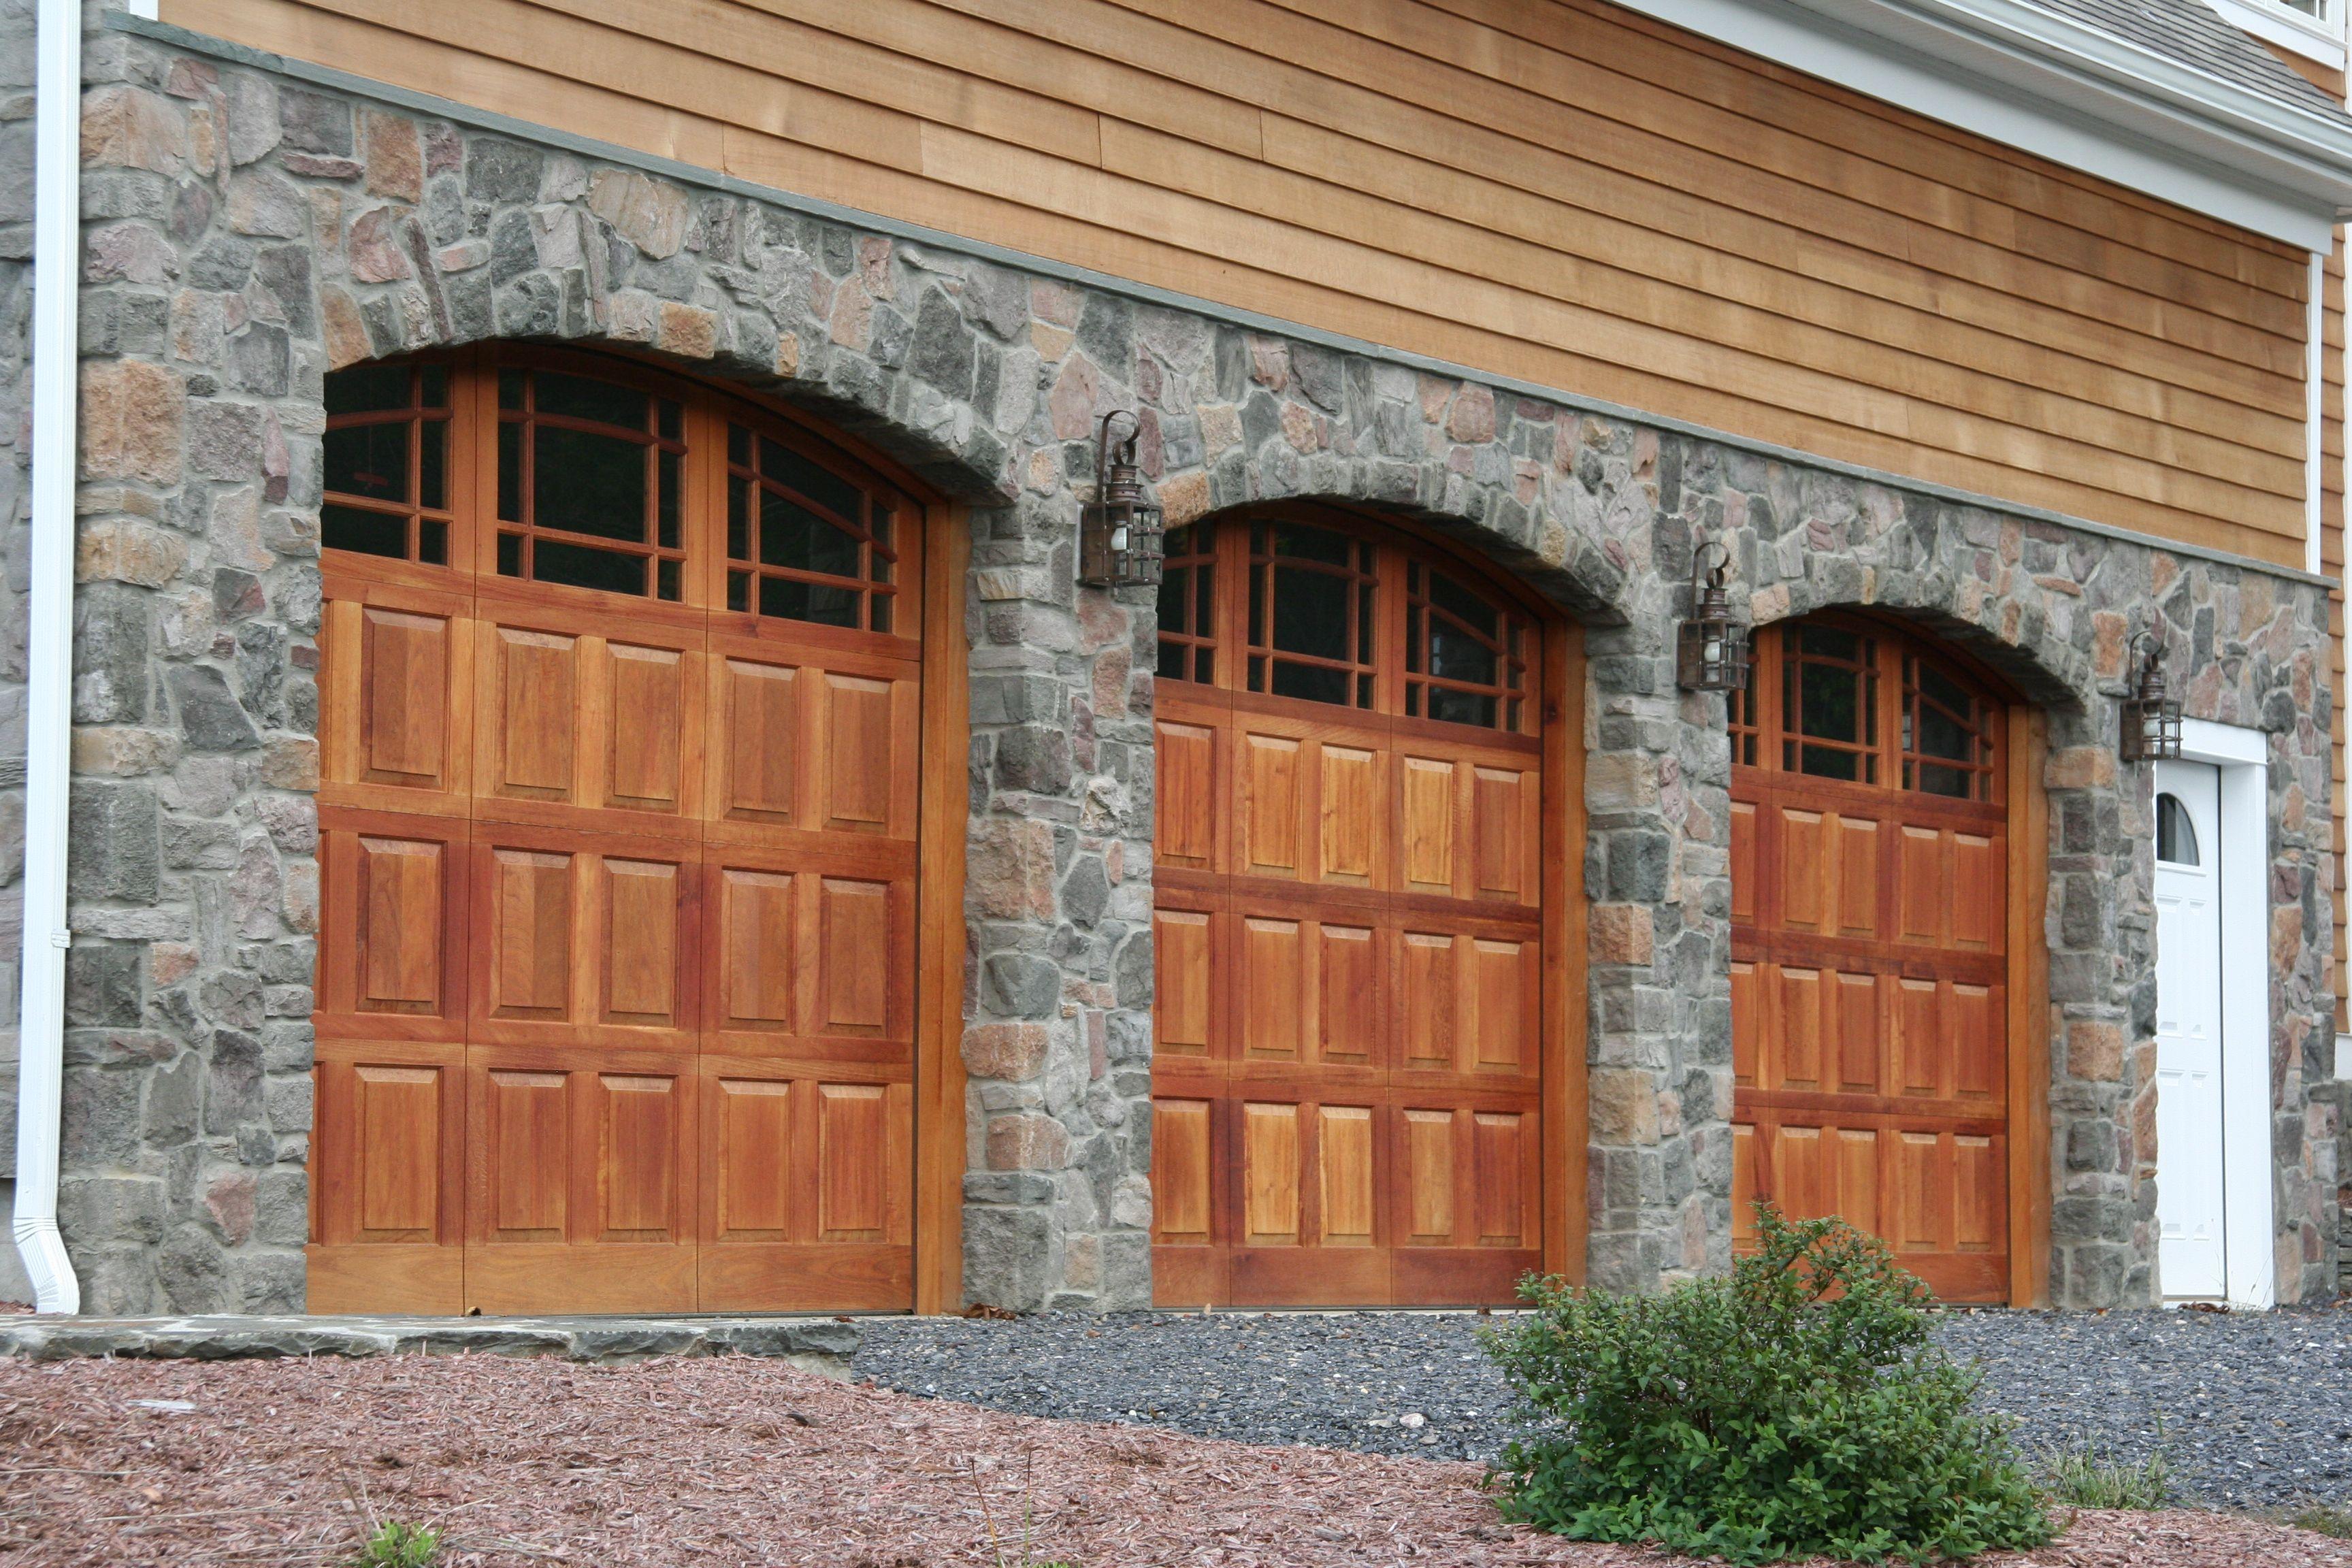 Stain Grade/Artisan Custom/Dutchess Overhead Doors, Inc.